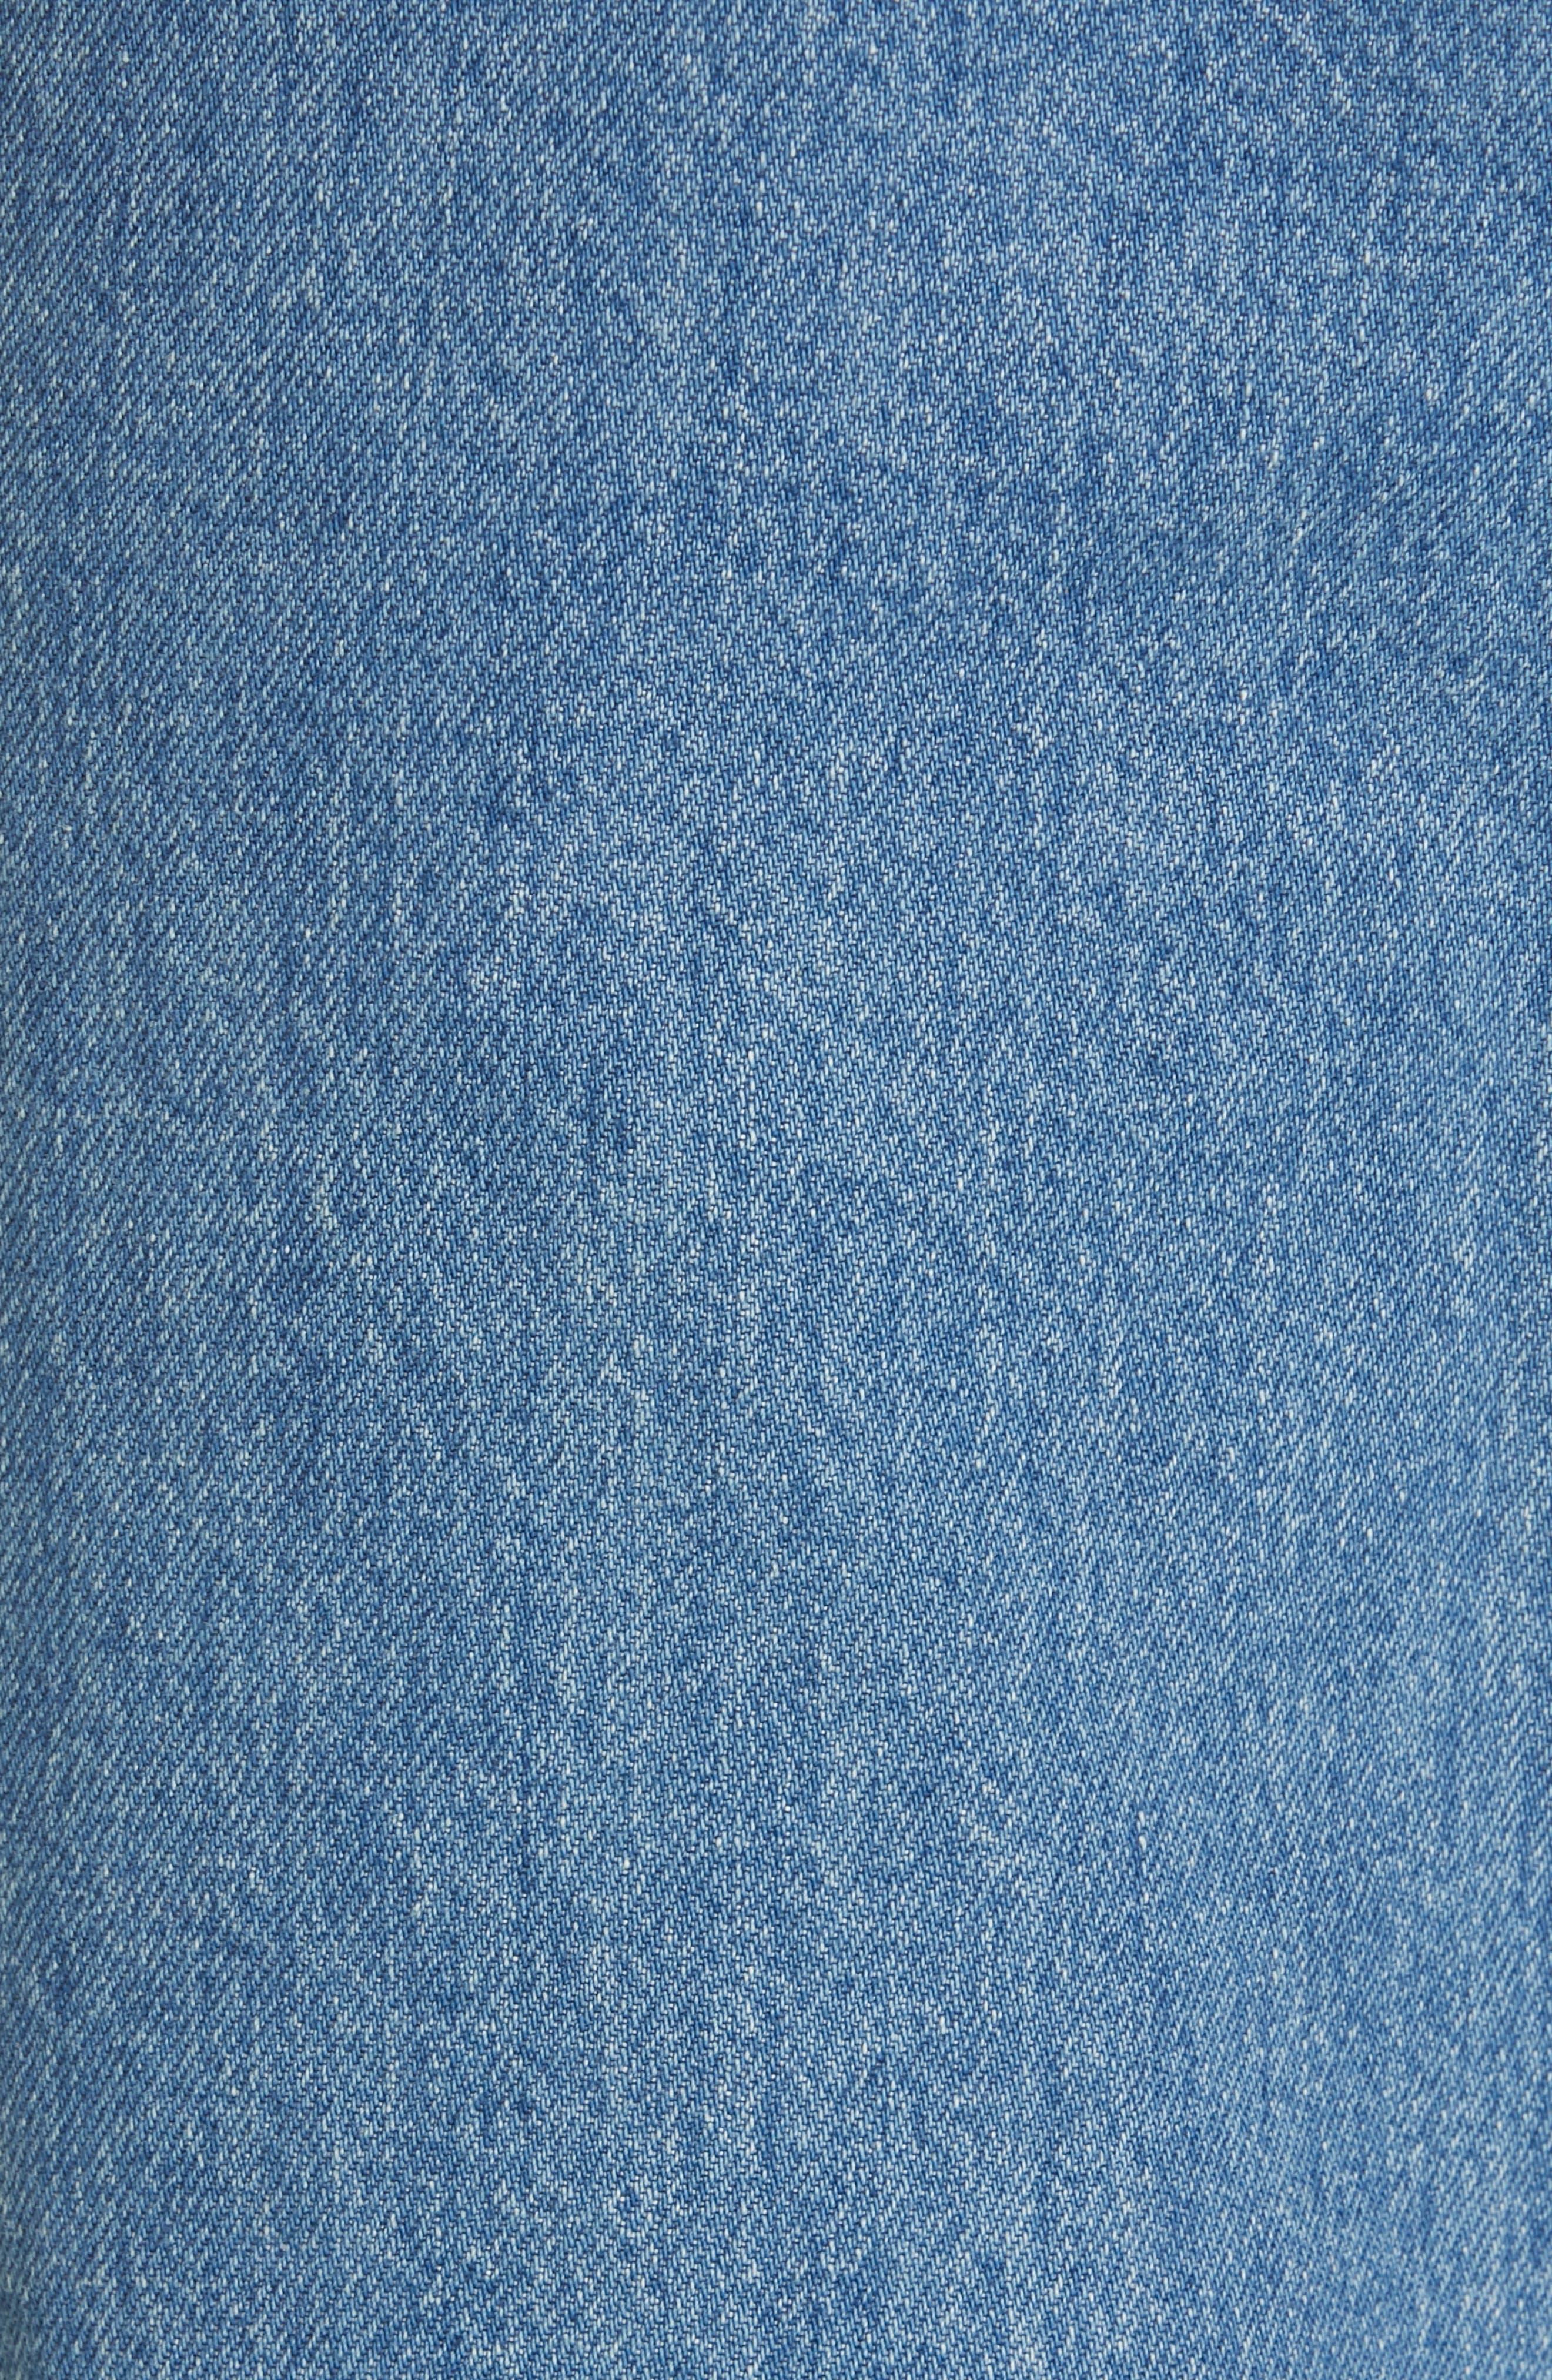 CALVIN KLEIN 205W39NYC, Jeans, Alternate thumbnail 5, color, BLUE